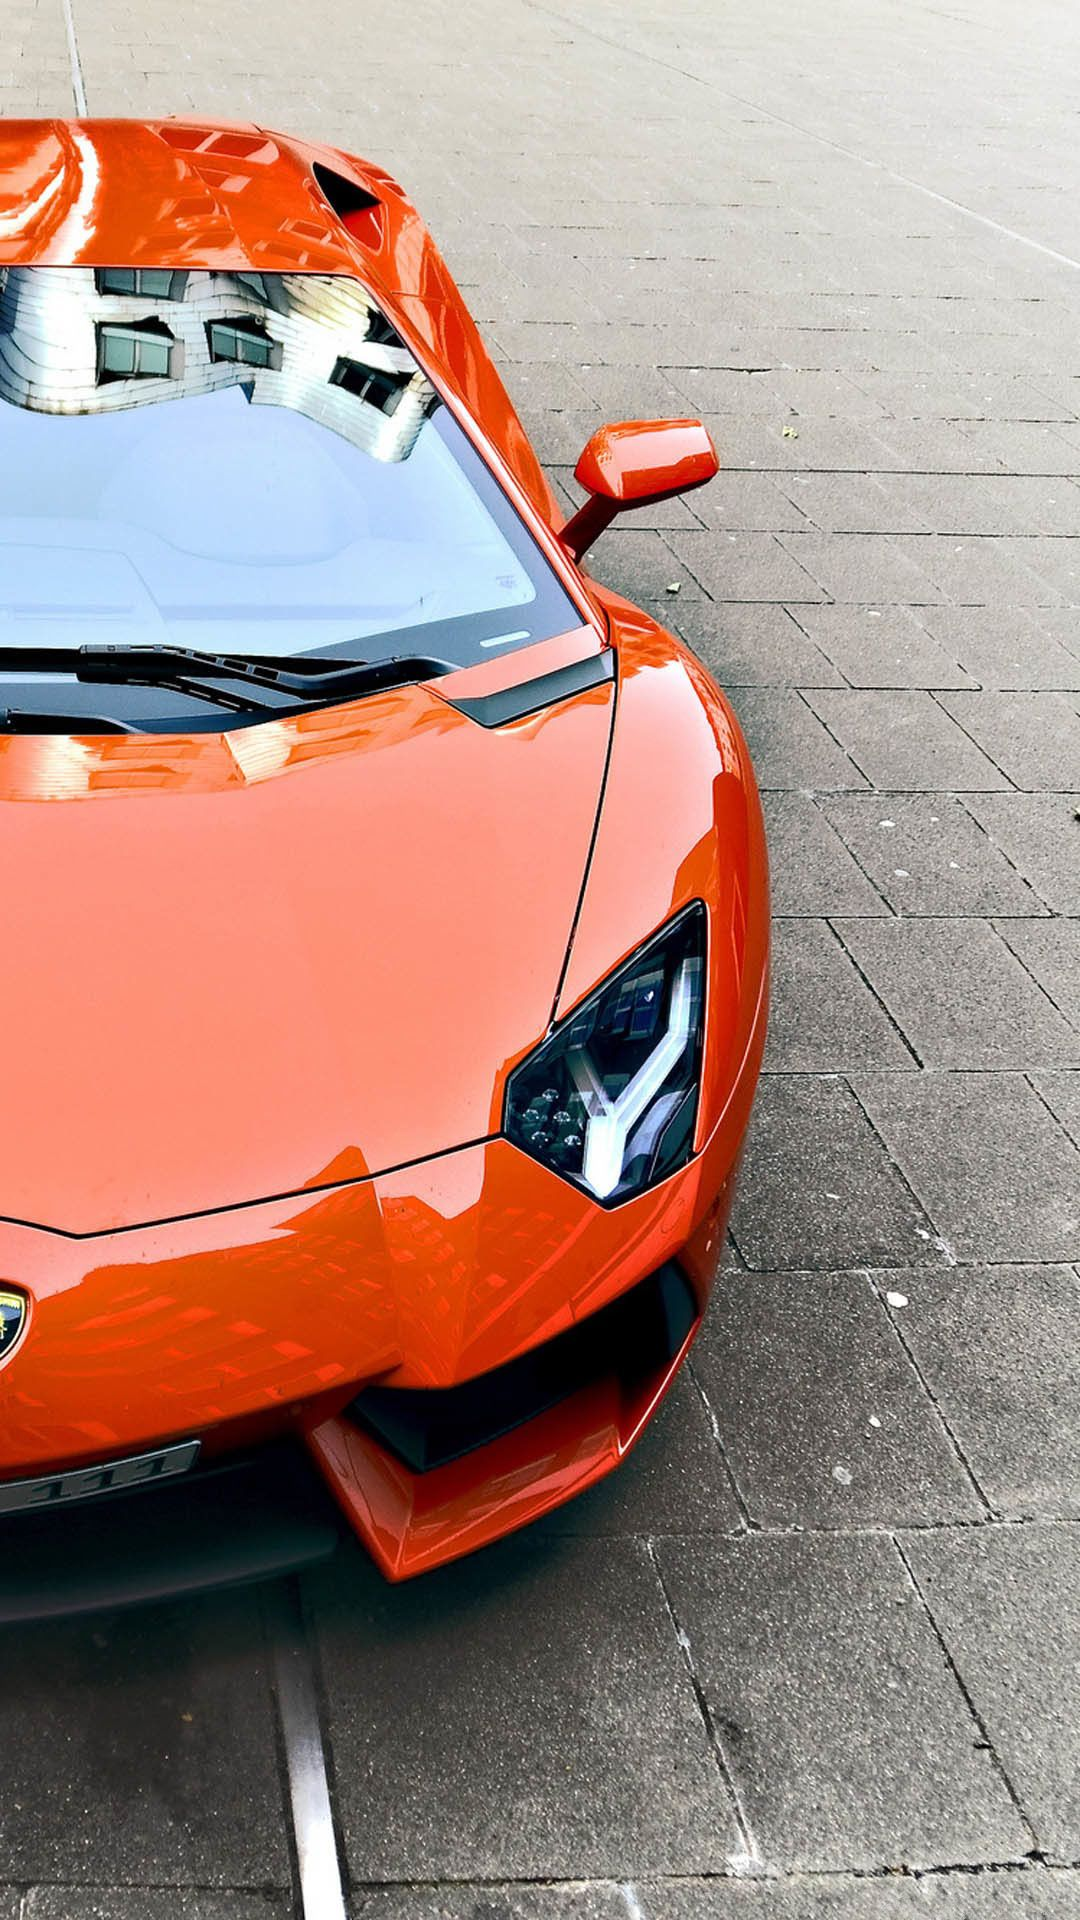 Car Phone Wallpapers Top Free Car Phone Backgrounds Wallpaperaccess